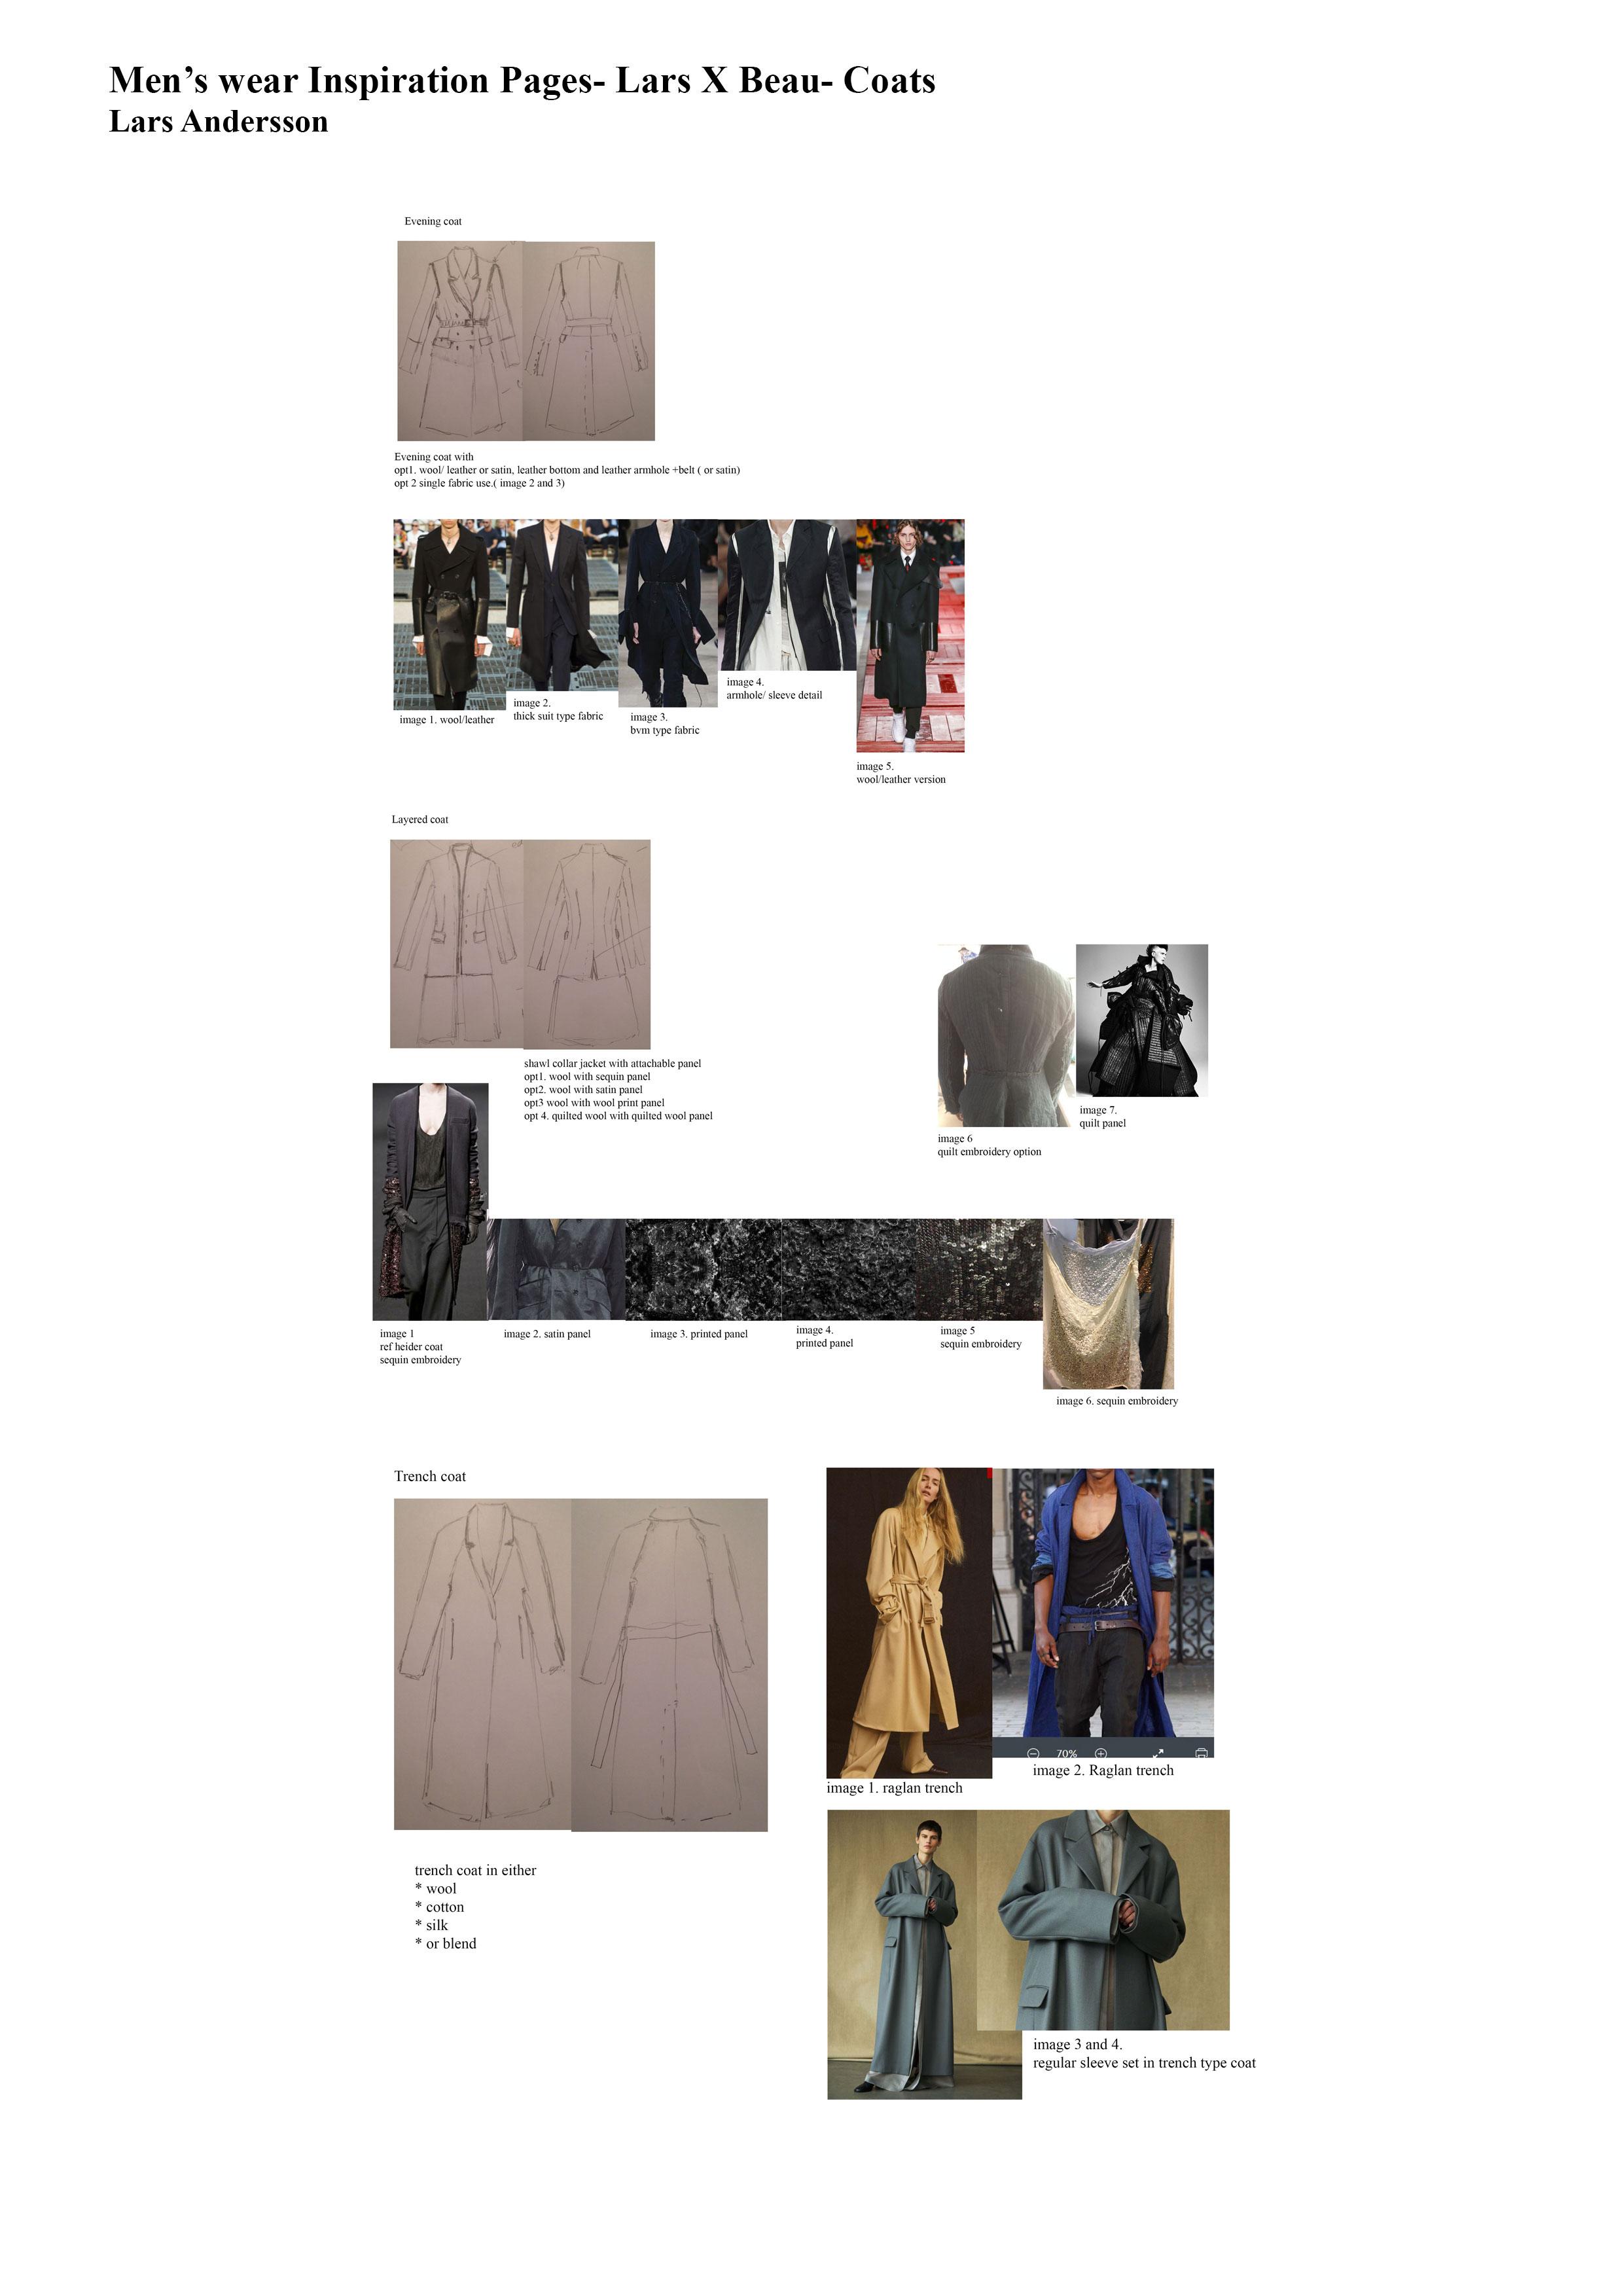 Lars-X-Beau-Coats.jpg